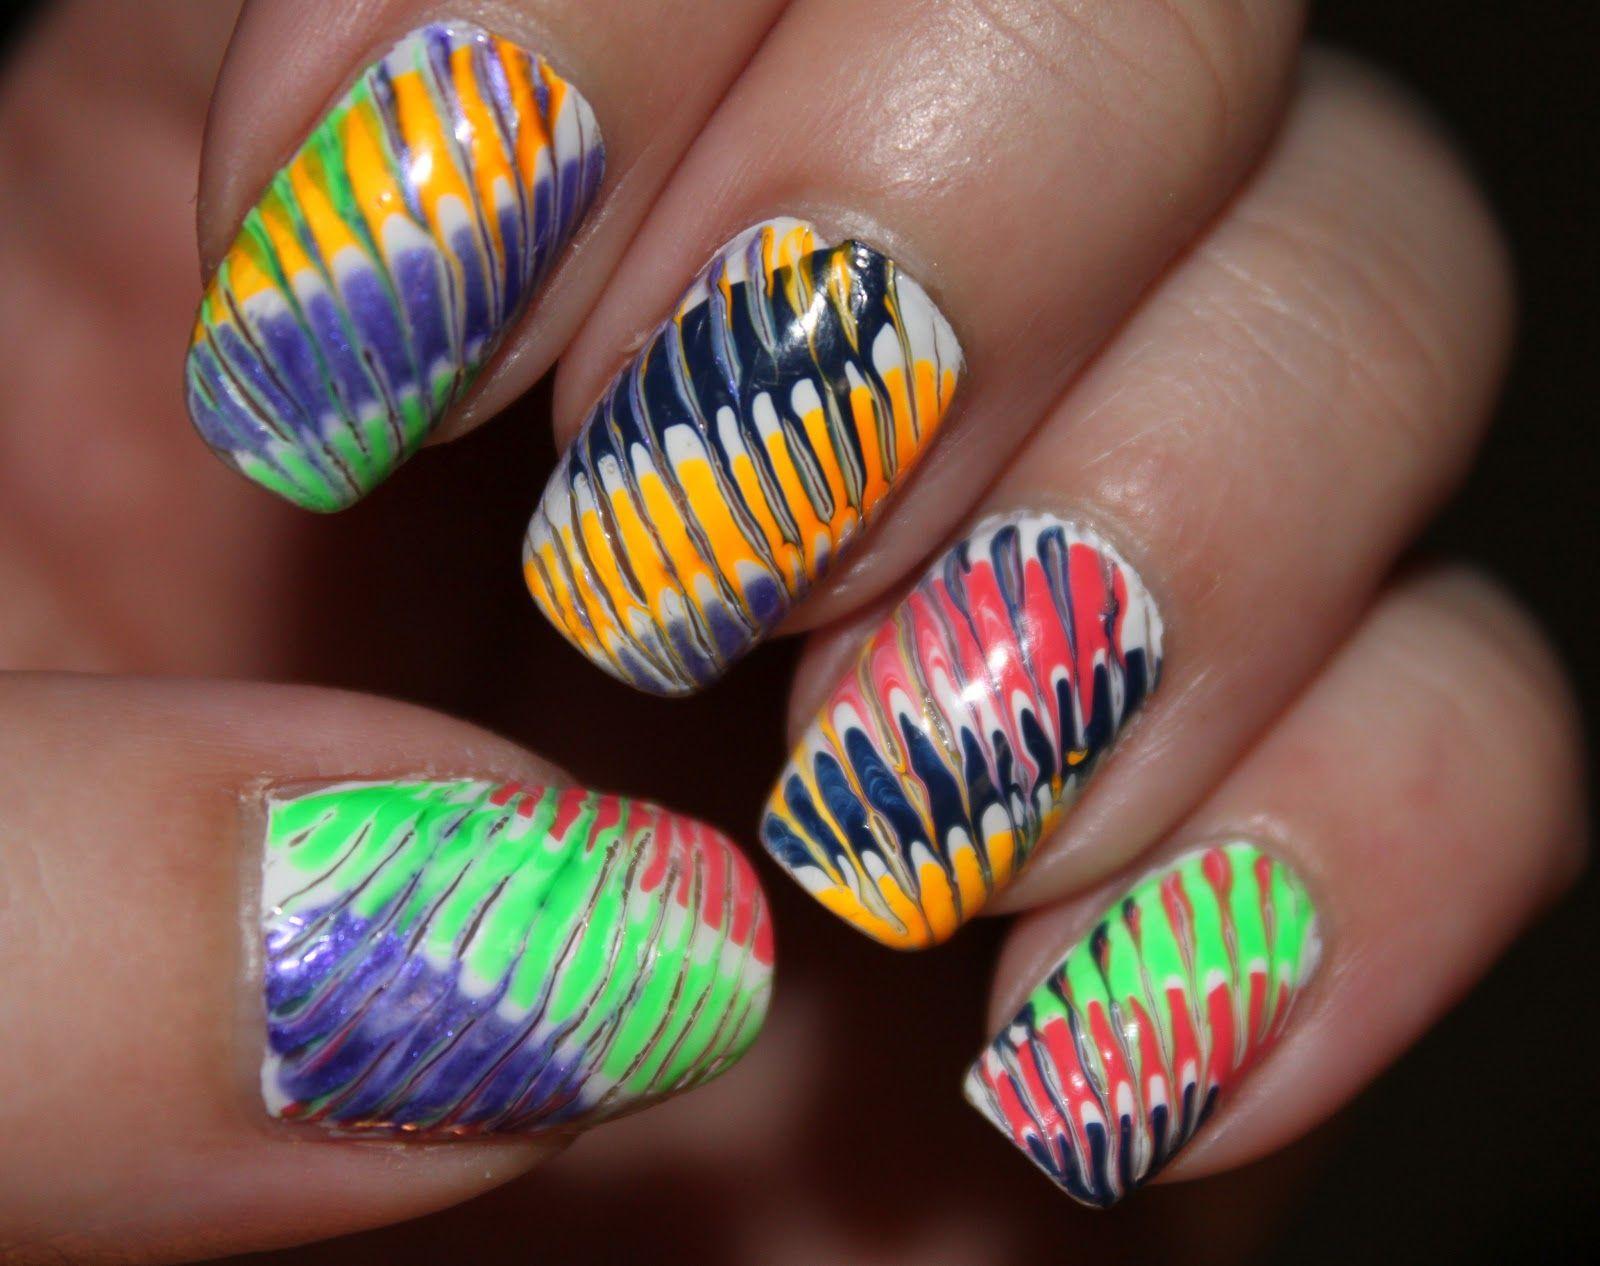 toothpick nail art nails